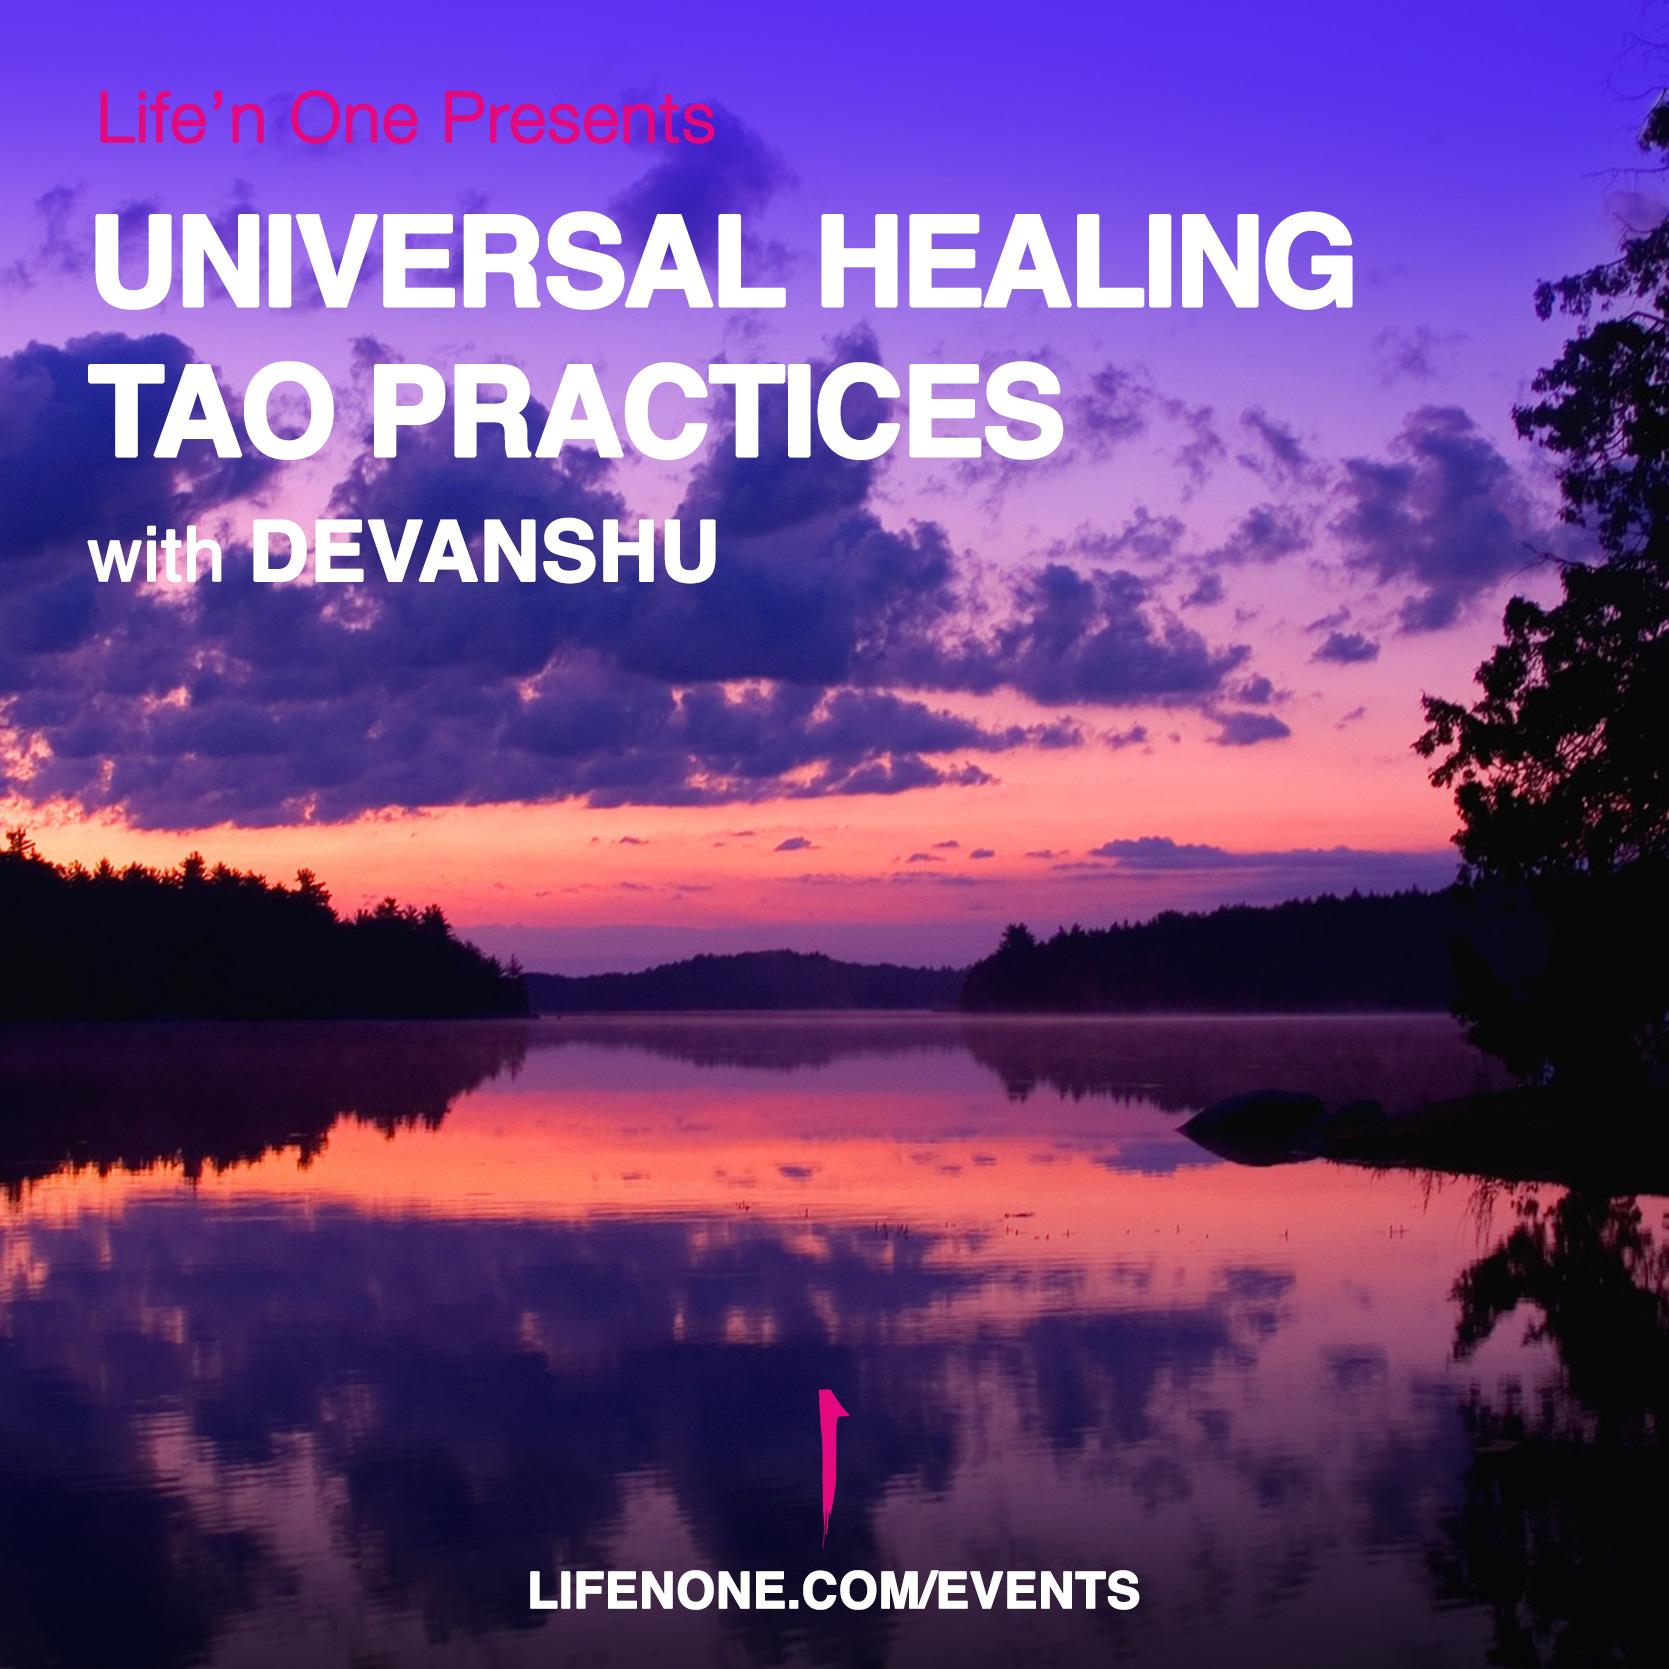 Universal-Healing-Tao-Practices-Workshop-with-Devnashu.jpg